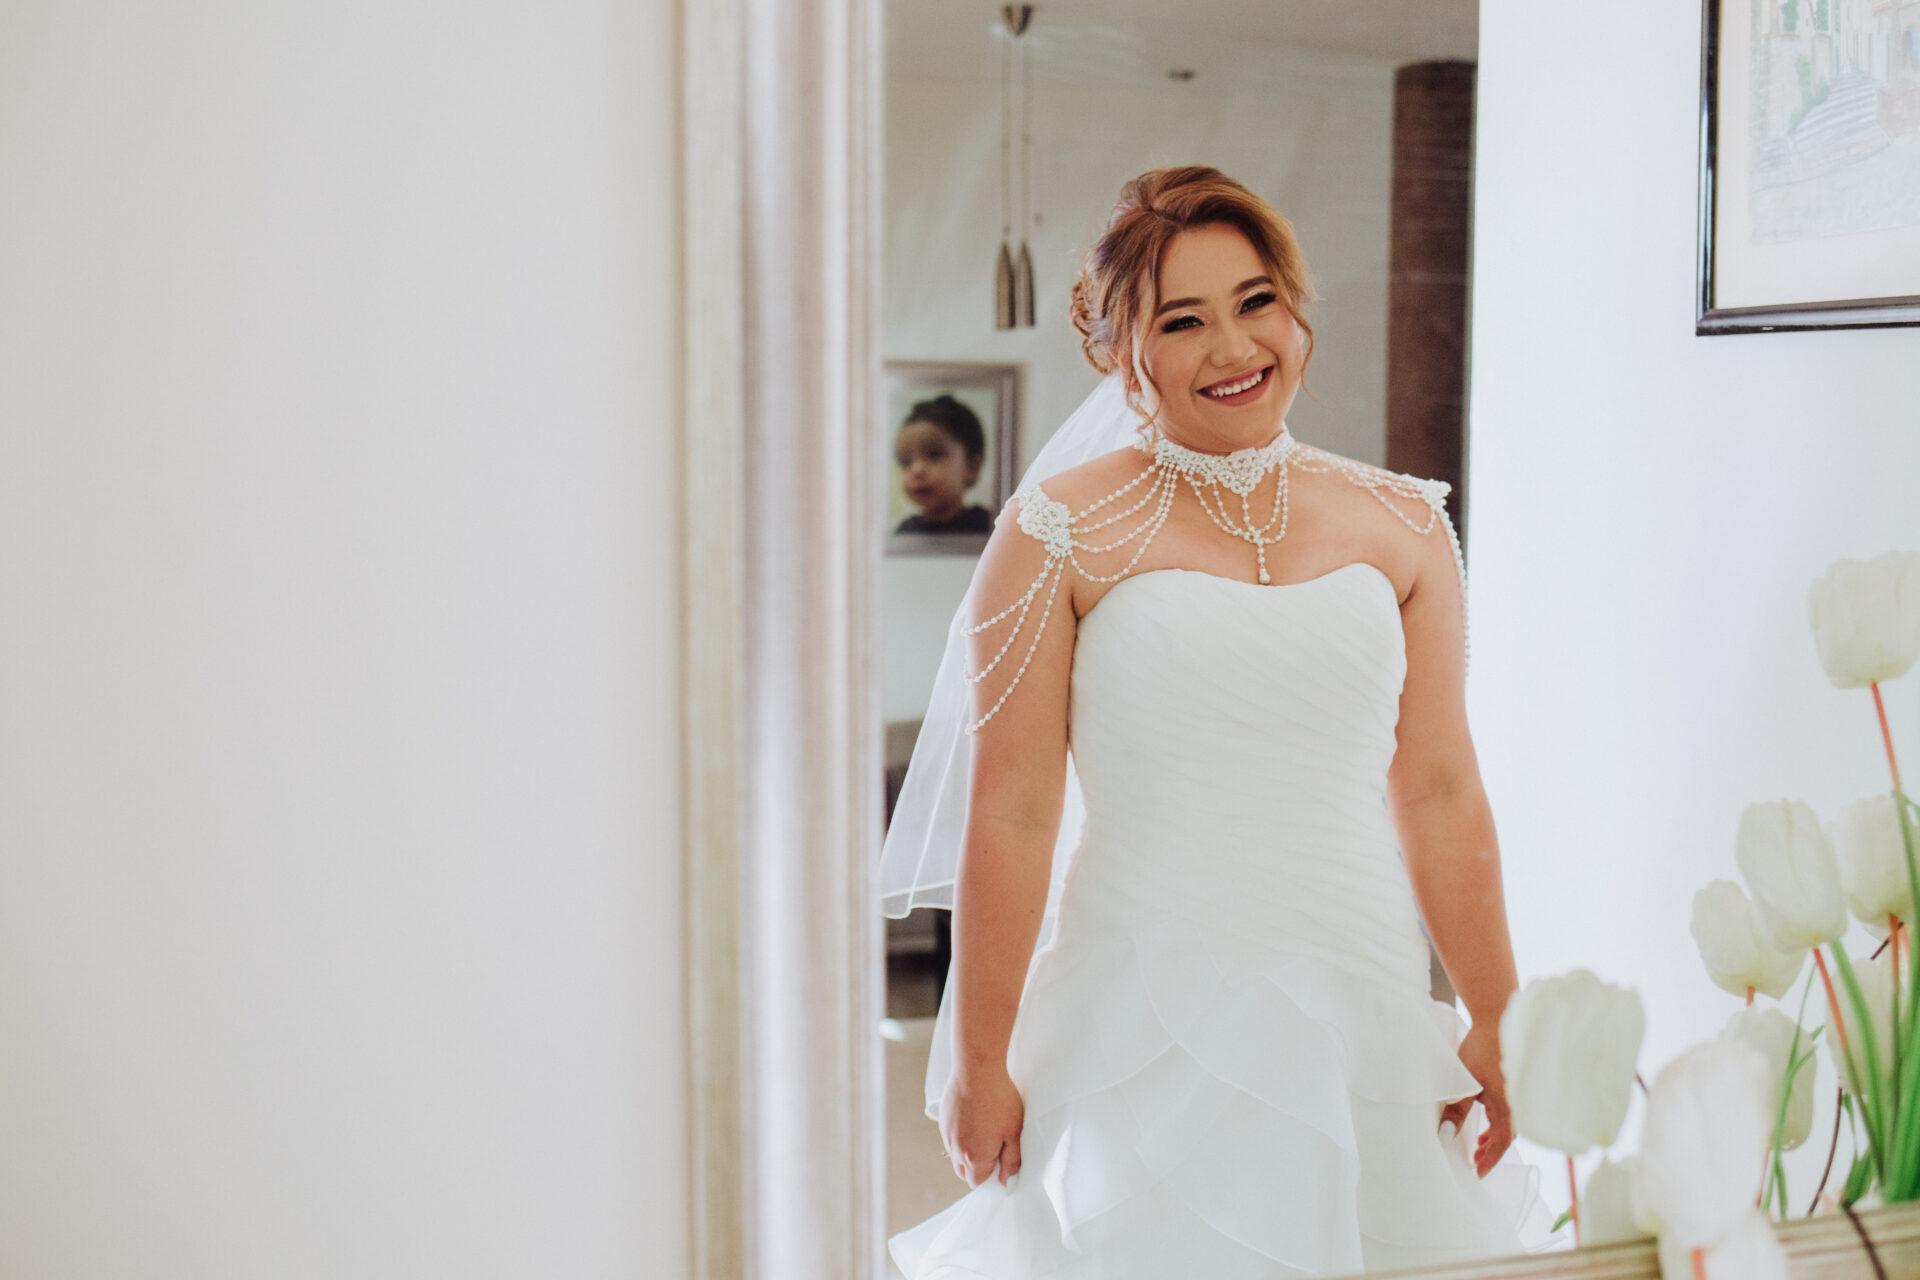 javier_noriega_fotografo_bodas_gaviones_zacatecas_wedding_photographer8